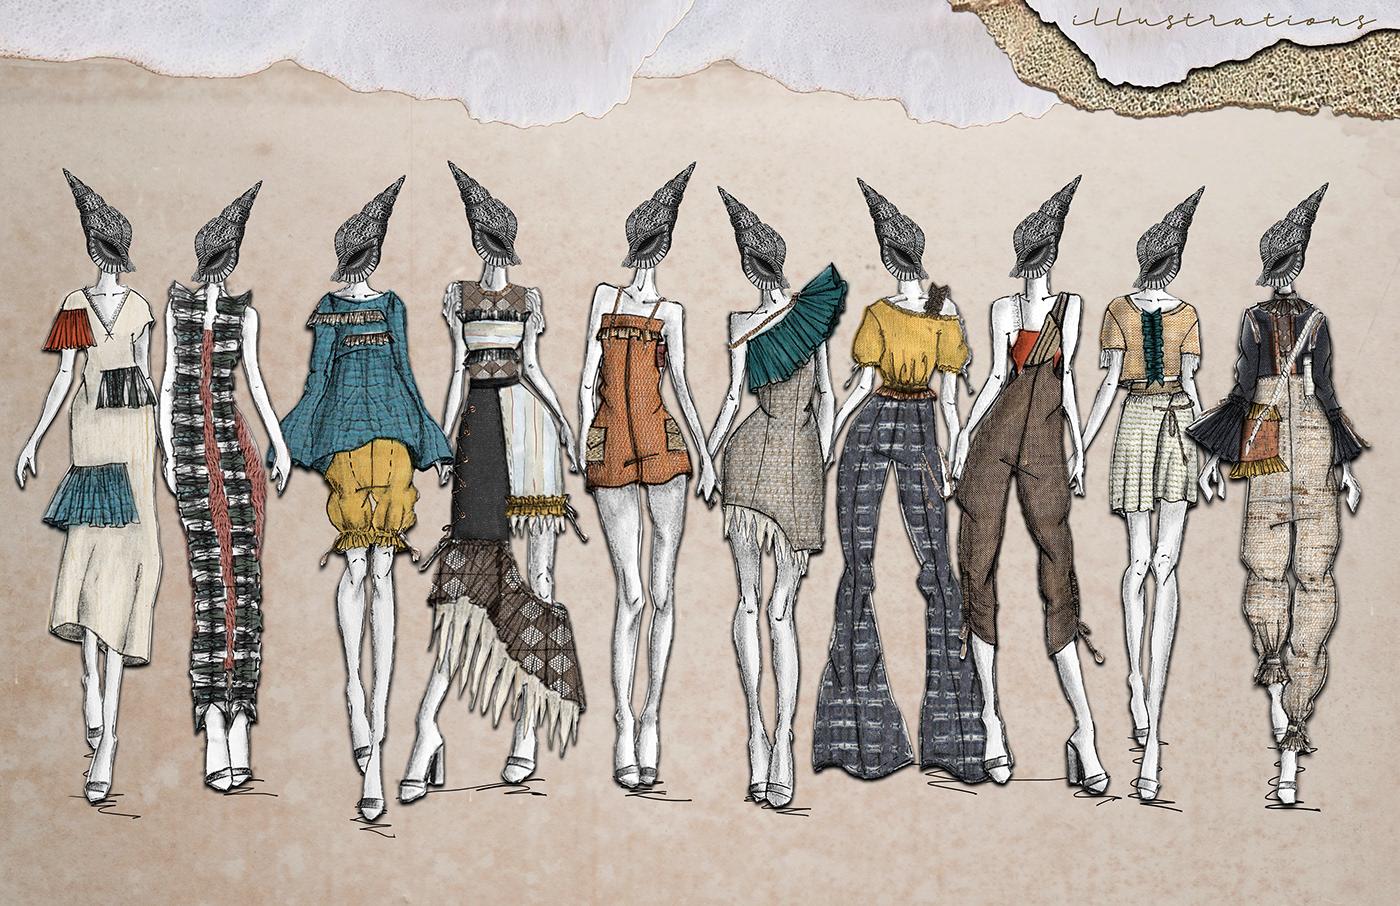 adobe illustrator Adobe Photoshop Collection concept development design portfolio design process fabric development fashion design fashion illustration Technical Design